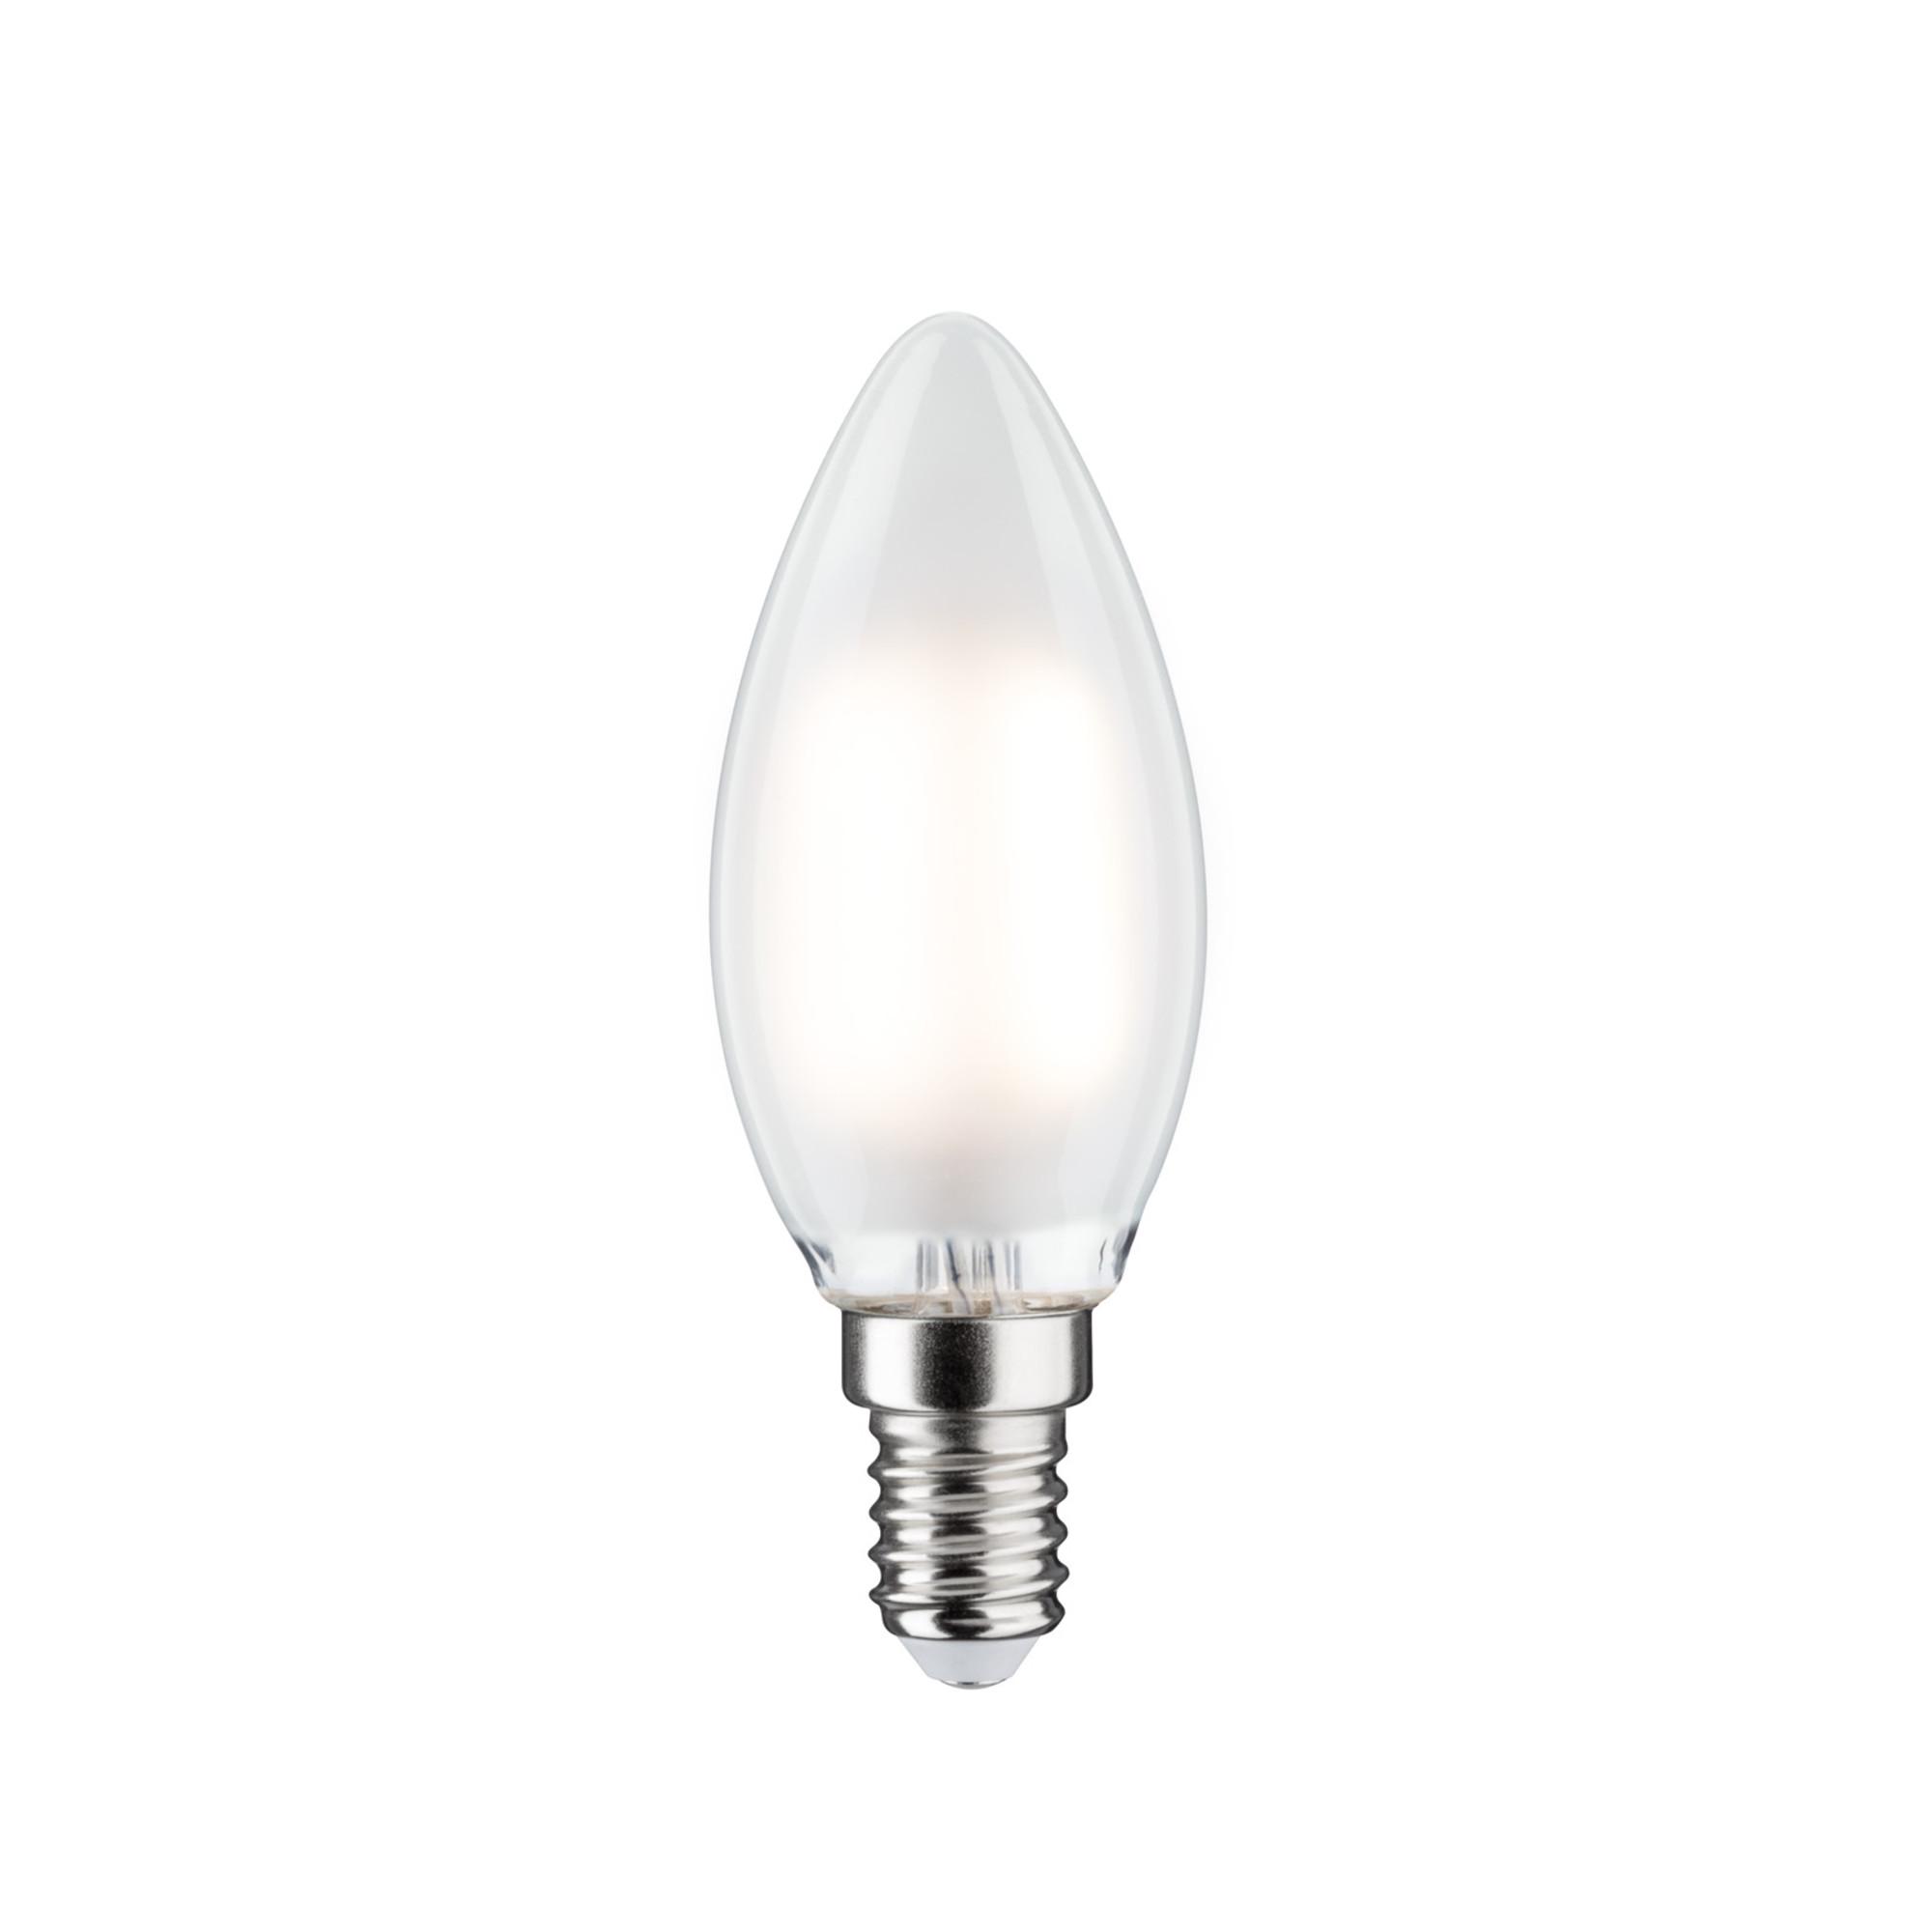 Лампа филаментная Paulmann Свеча 2.5Вт 250лм 2700К E14 230В Сатин 28366.